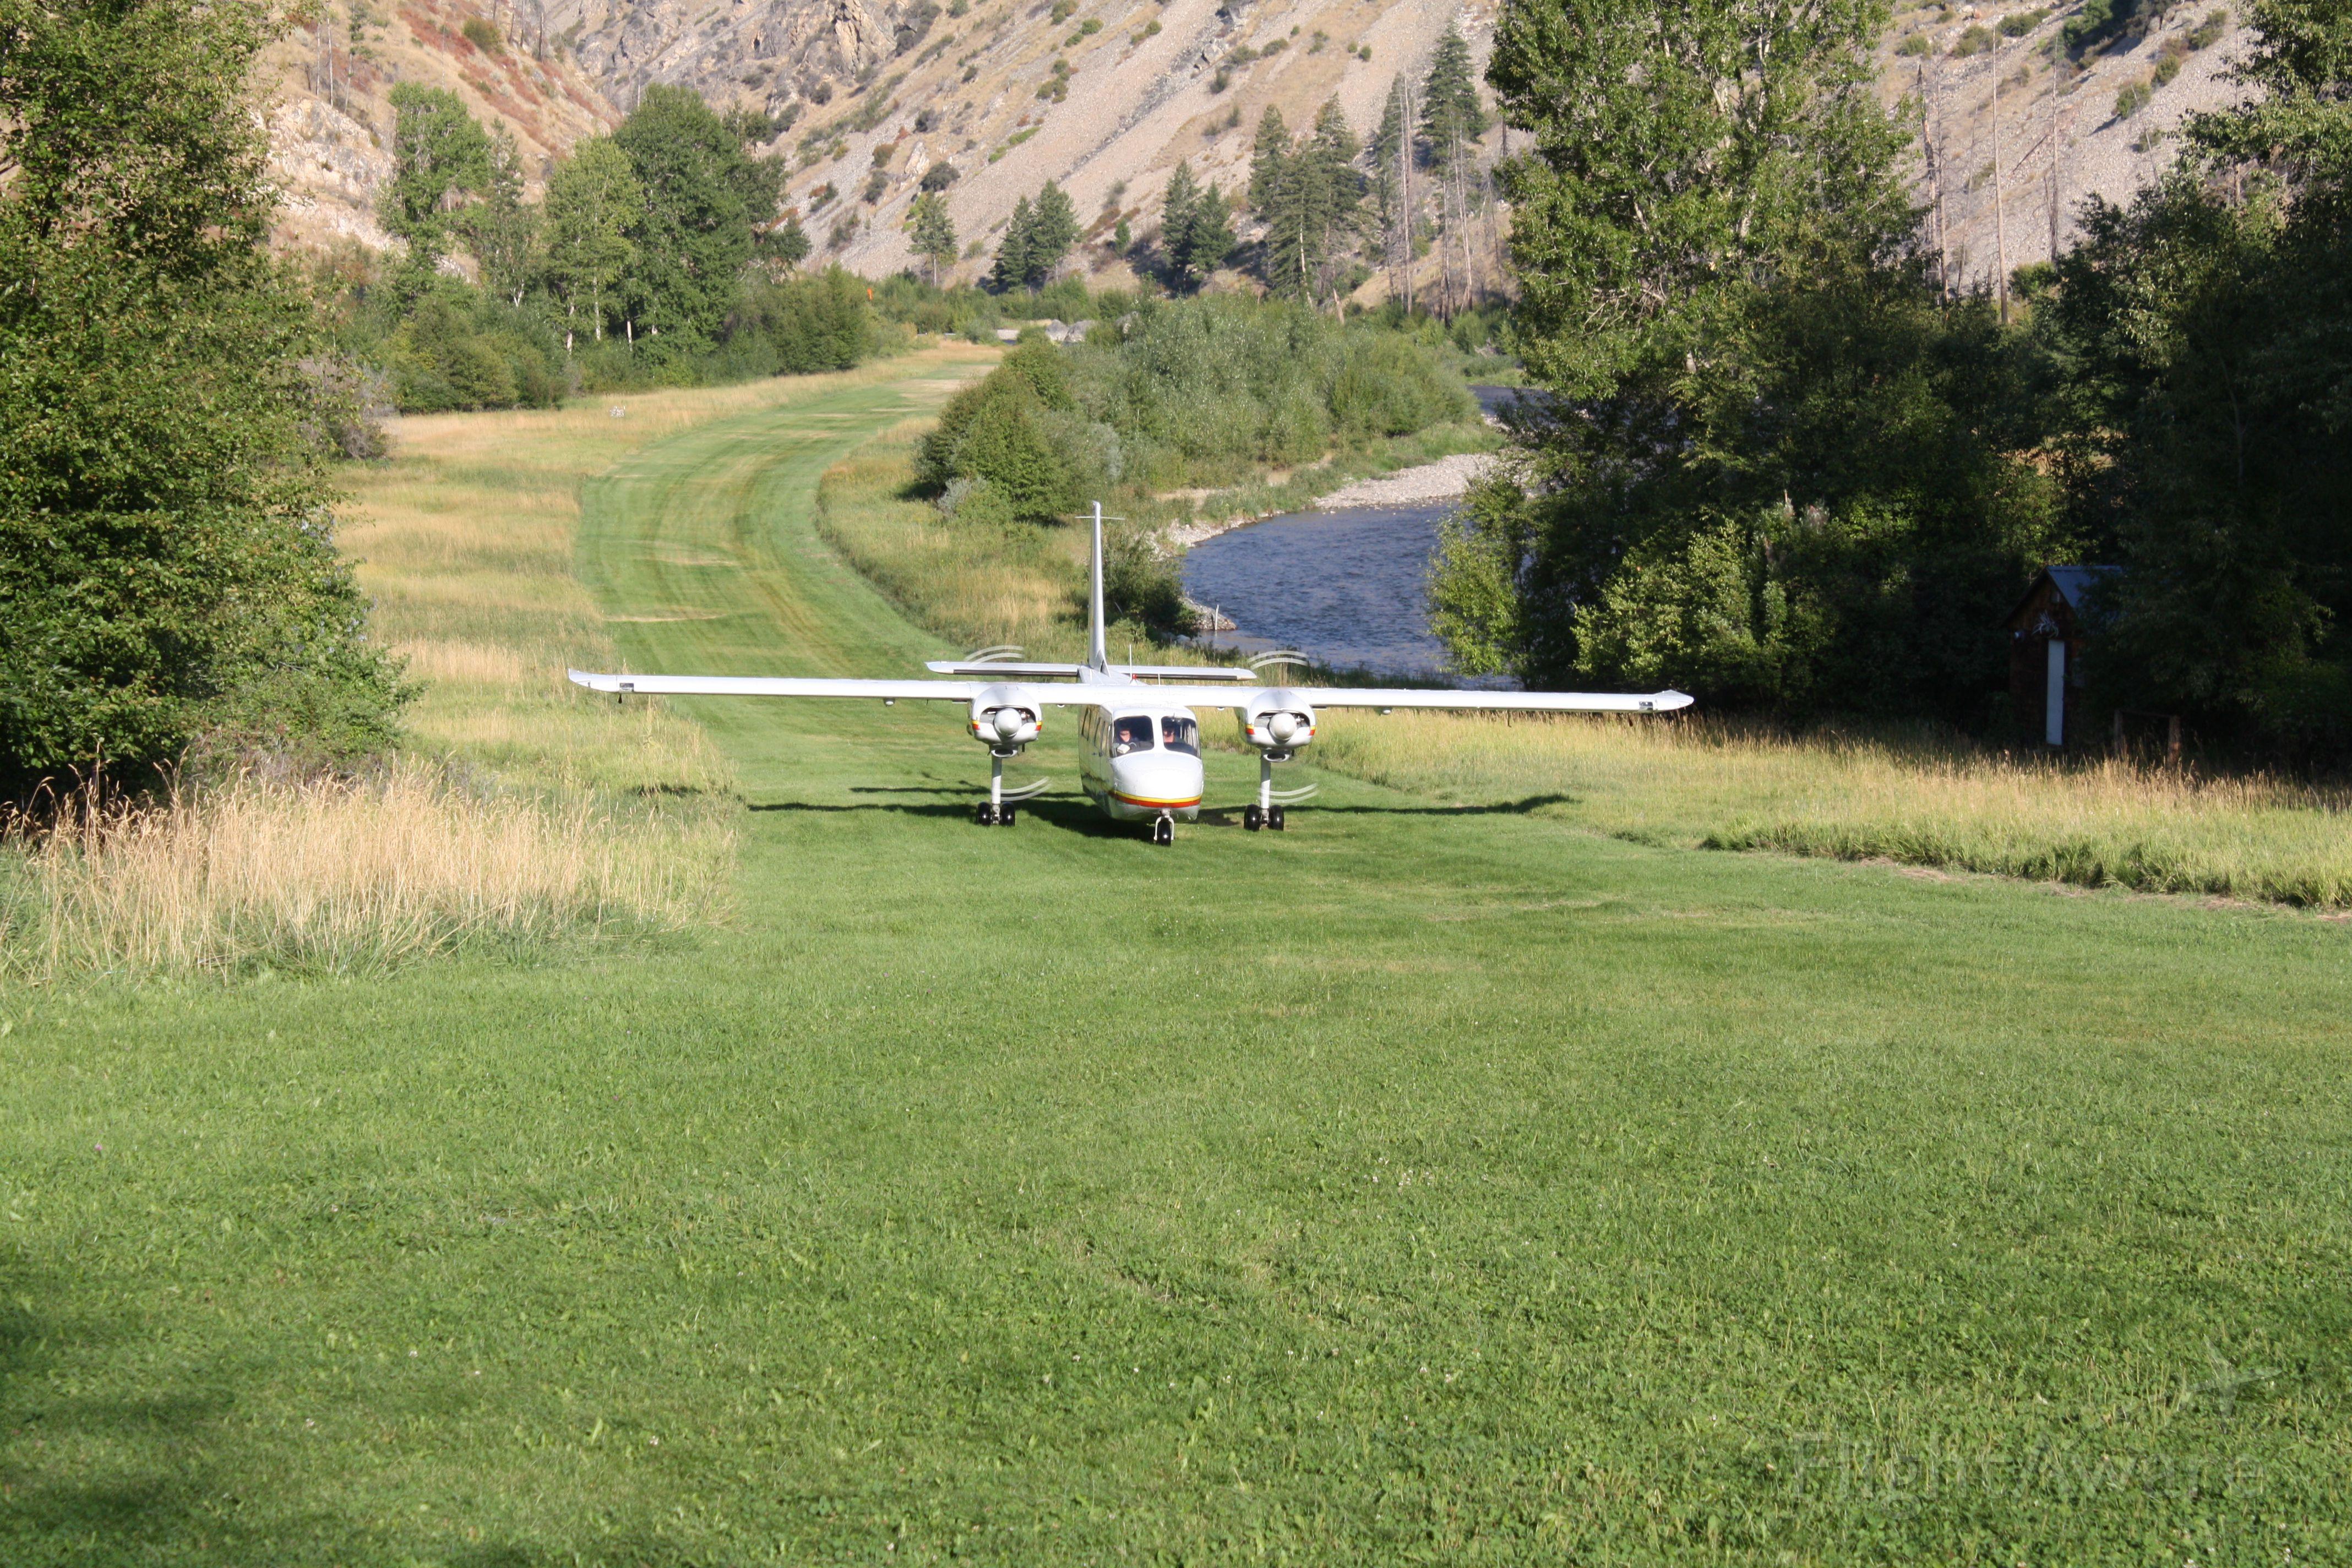 — — - Britten-Norman Islander taxiing at University of Idaho